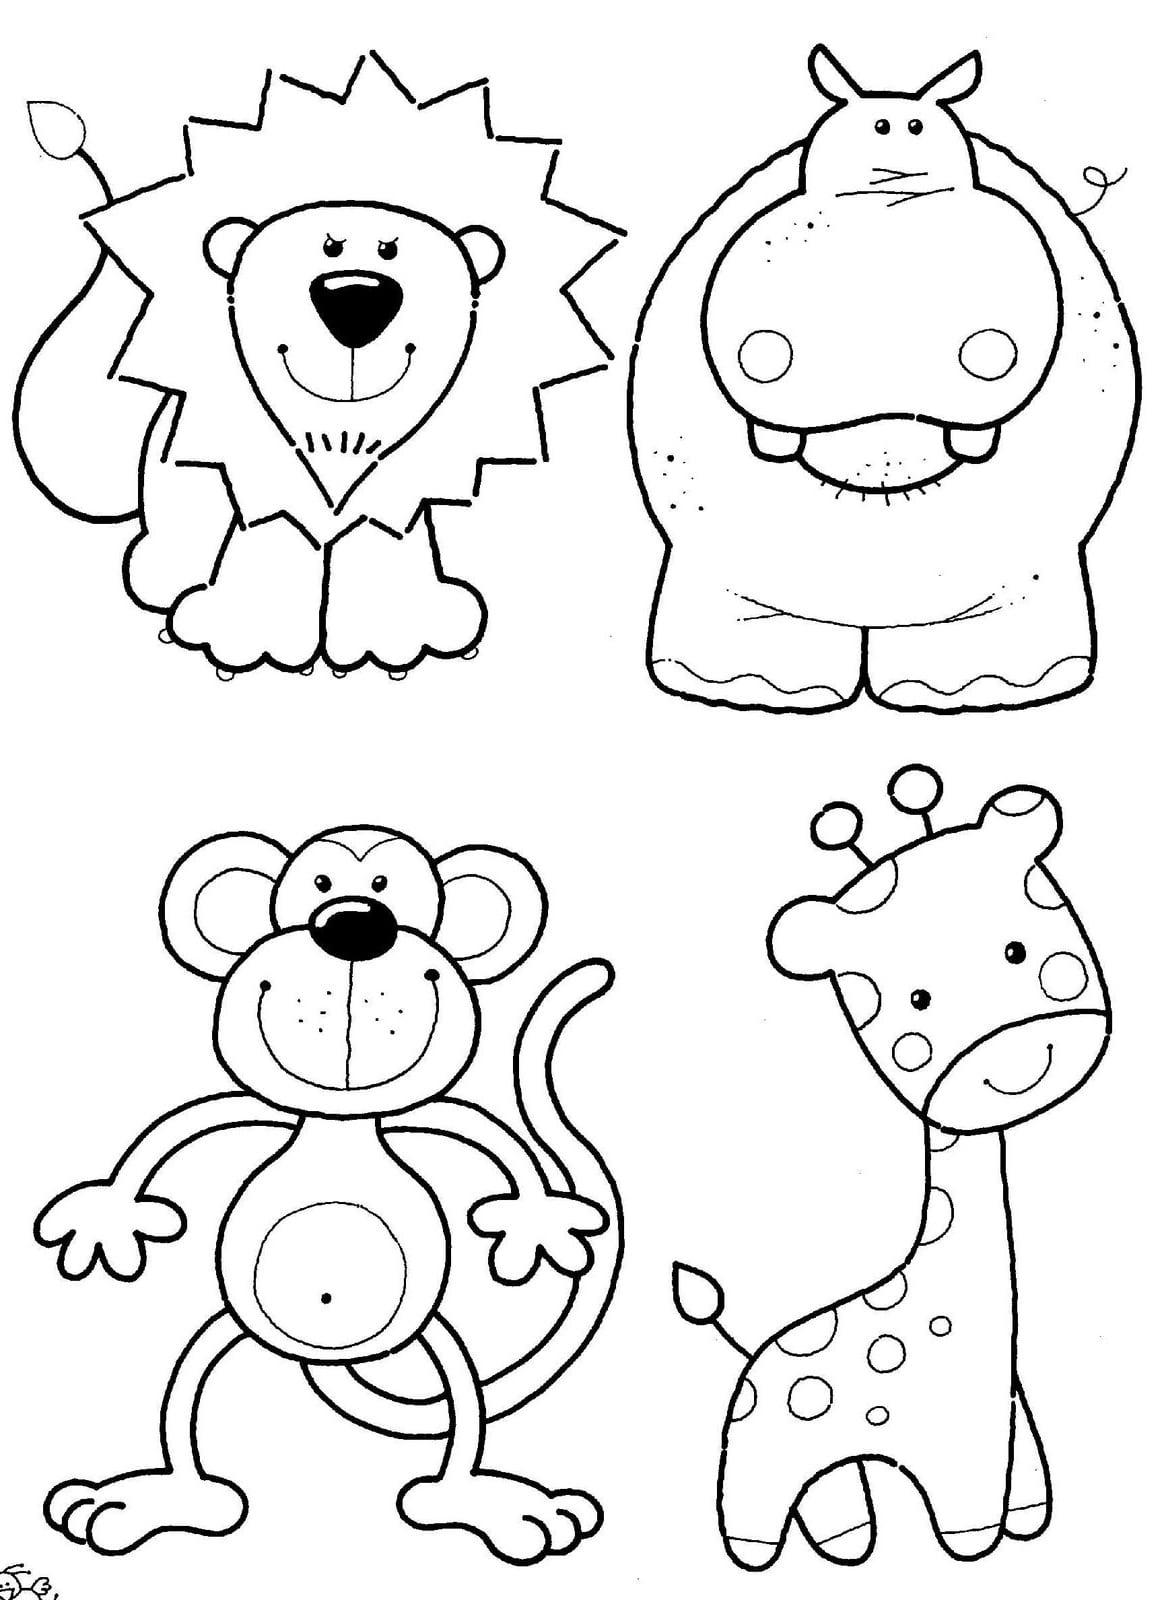 Desenho De Animal Para Colorir